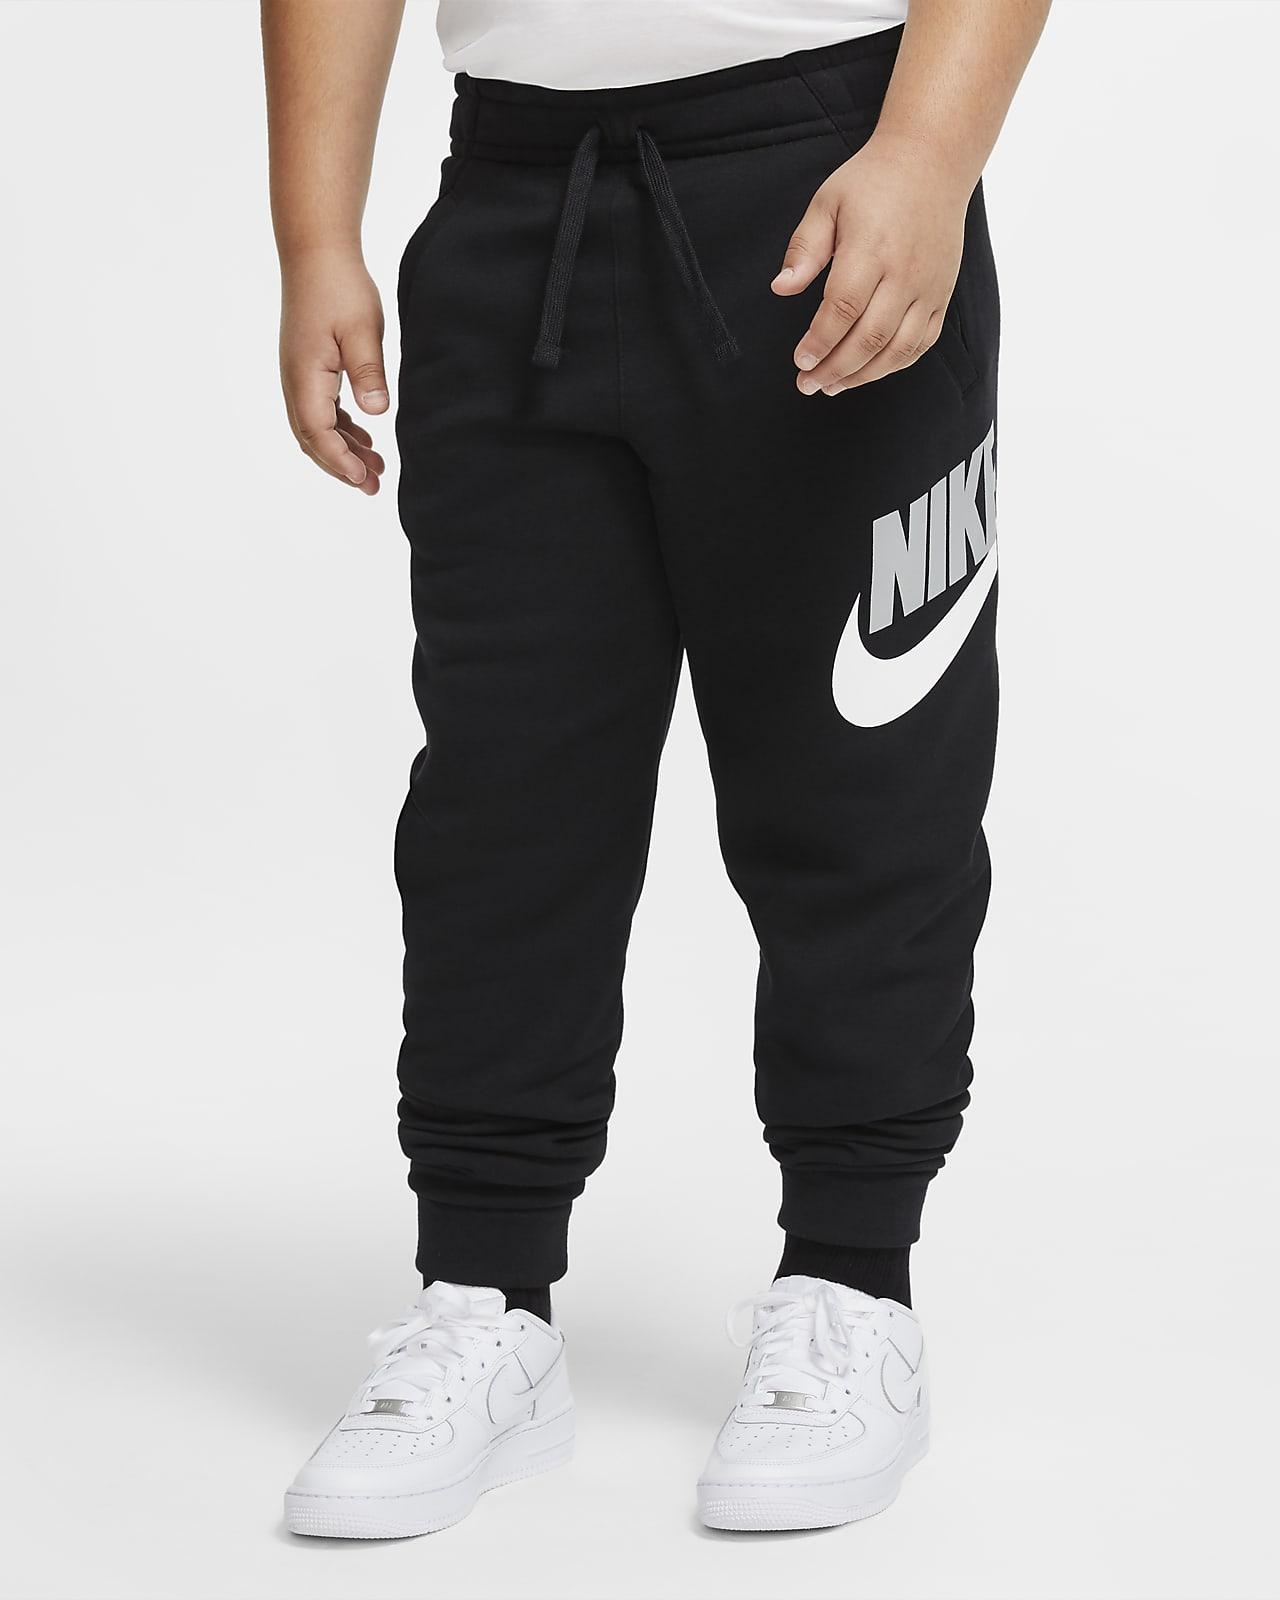 Pantaloni Nike Sportswear Club Fleece (Extended Size) - Ragazzo